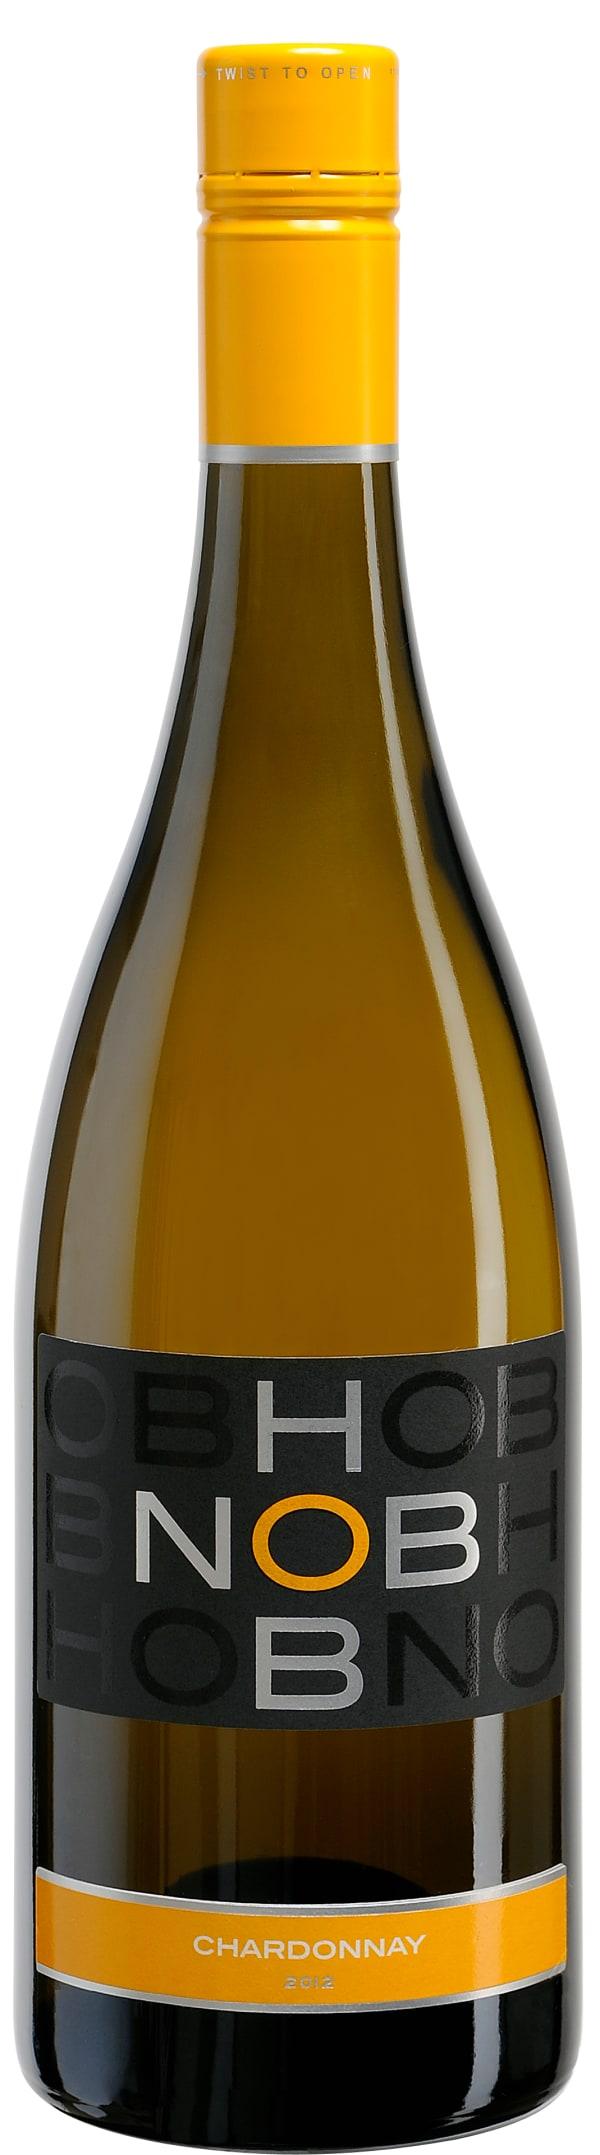 Hob Nob Chardonnay 2018